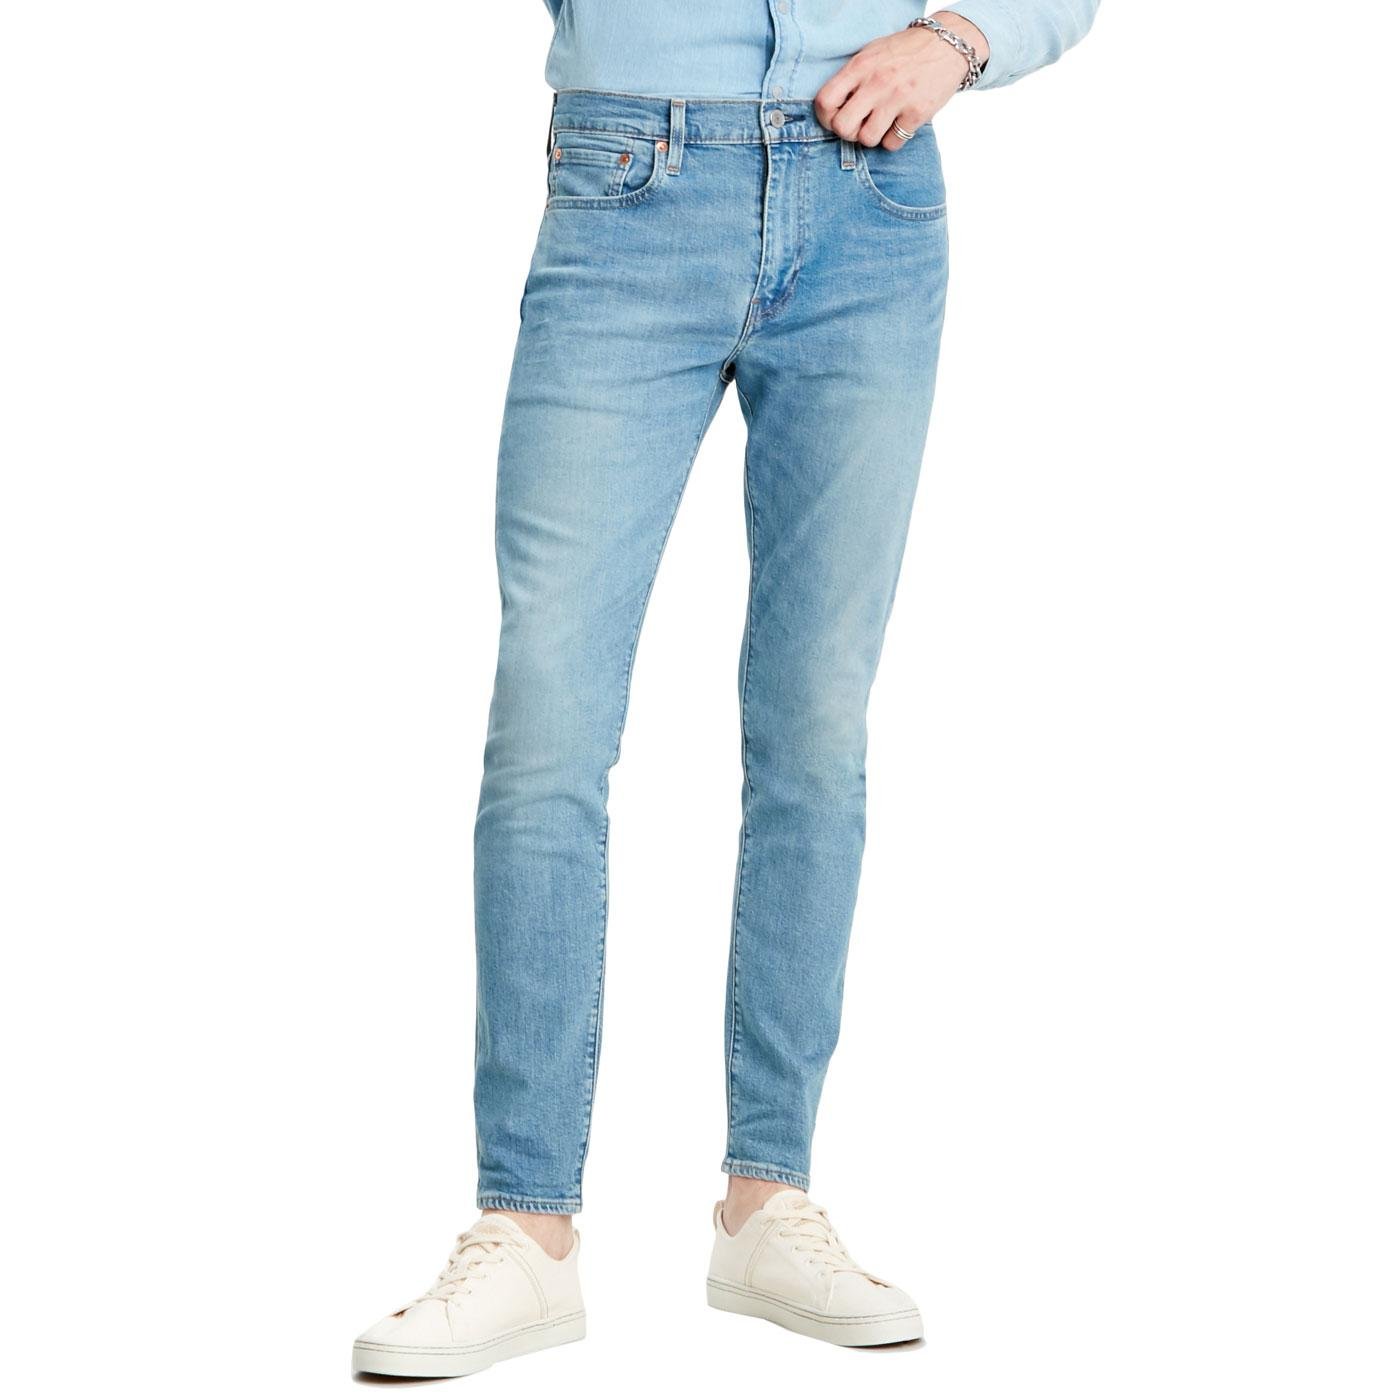 LEVI'S 512 Slim Taper Denim Jeans (Pelican Rust)